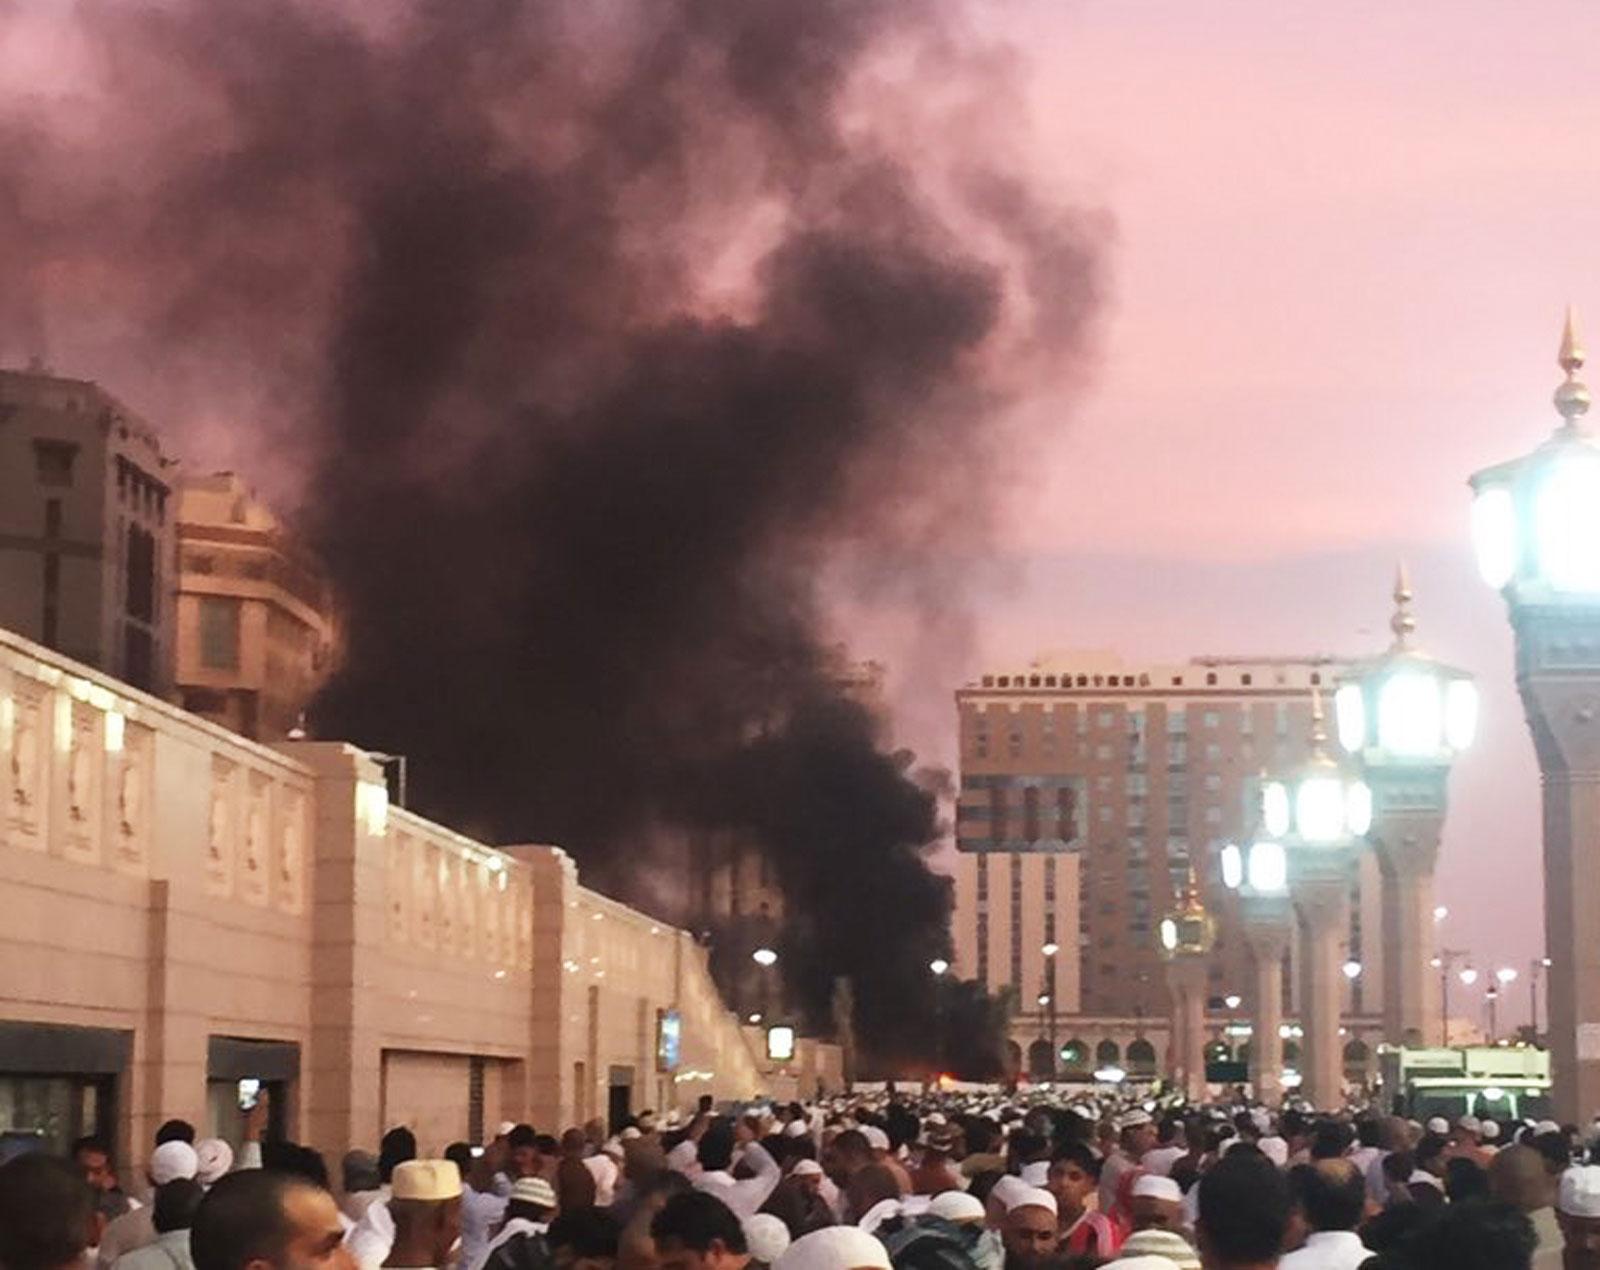 An explosion near the Mosque of the Prophet, Medina, Saudi Arabia, July 4, 2016